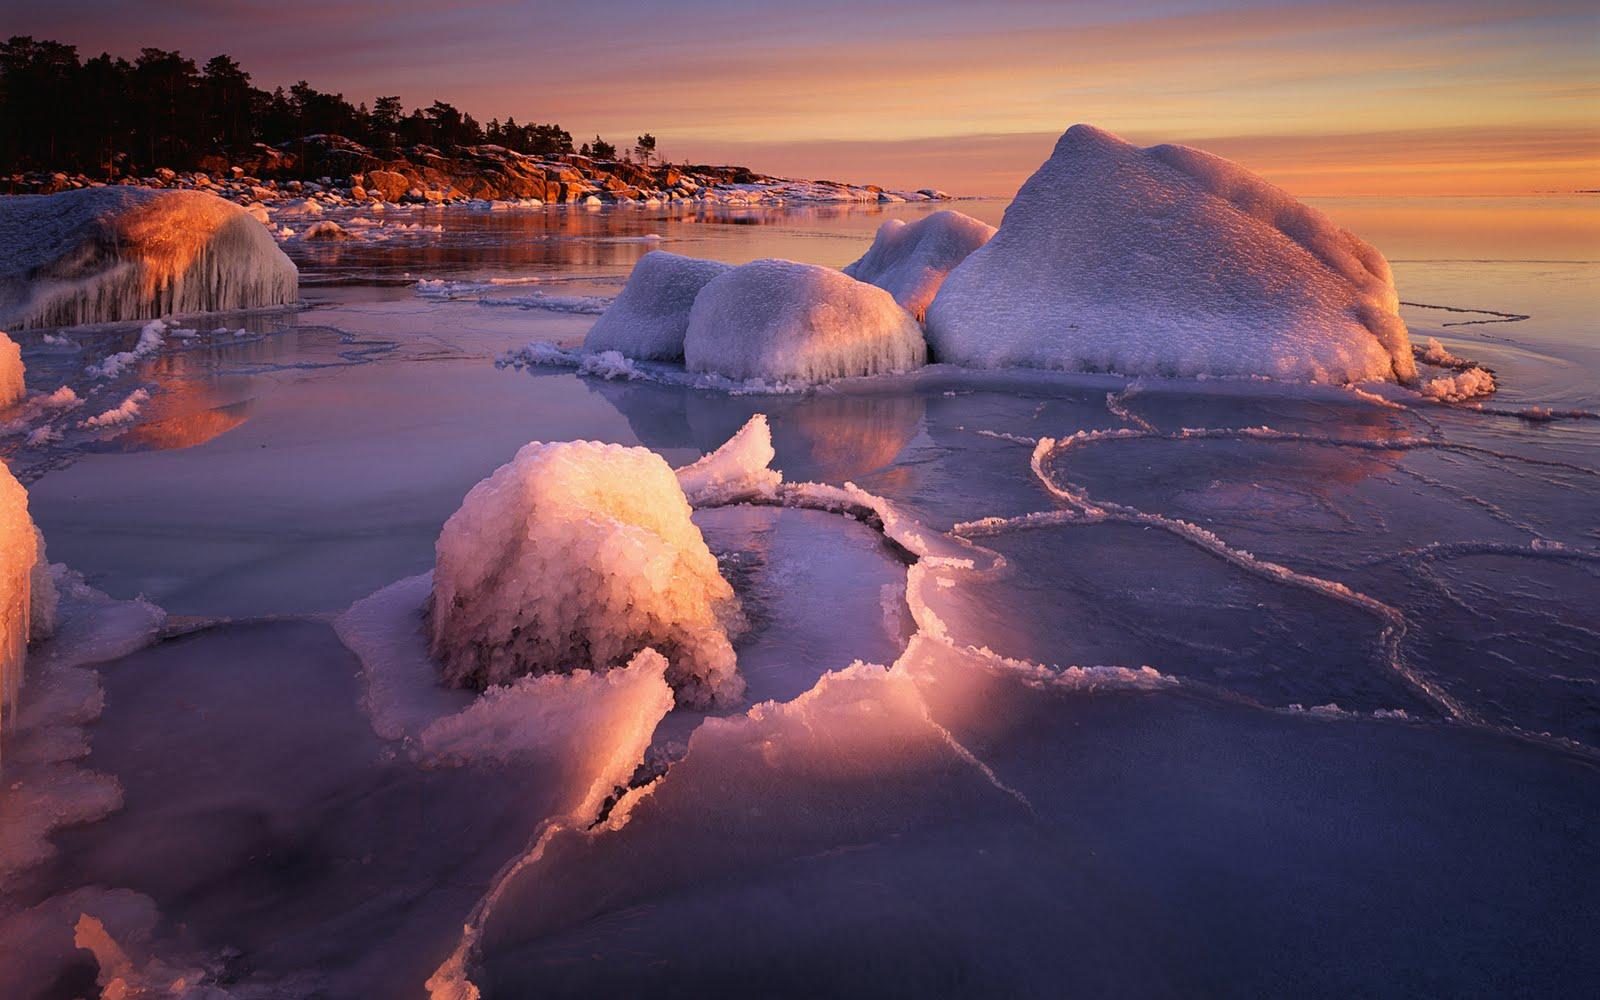 http://4.bp.blogspot.com/_W1ueYt1O3xs/TQqEGLJMuOI/AAAAAAAAXcI/RMRKPLYE3ZU/d/Winter+Landscape+Wallpapers+%25289%2529.jpg